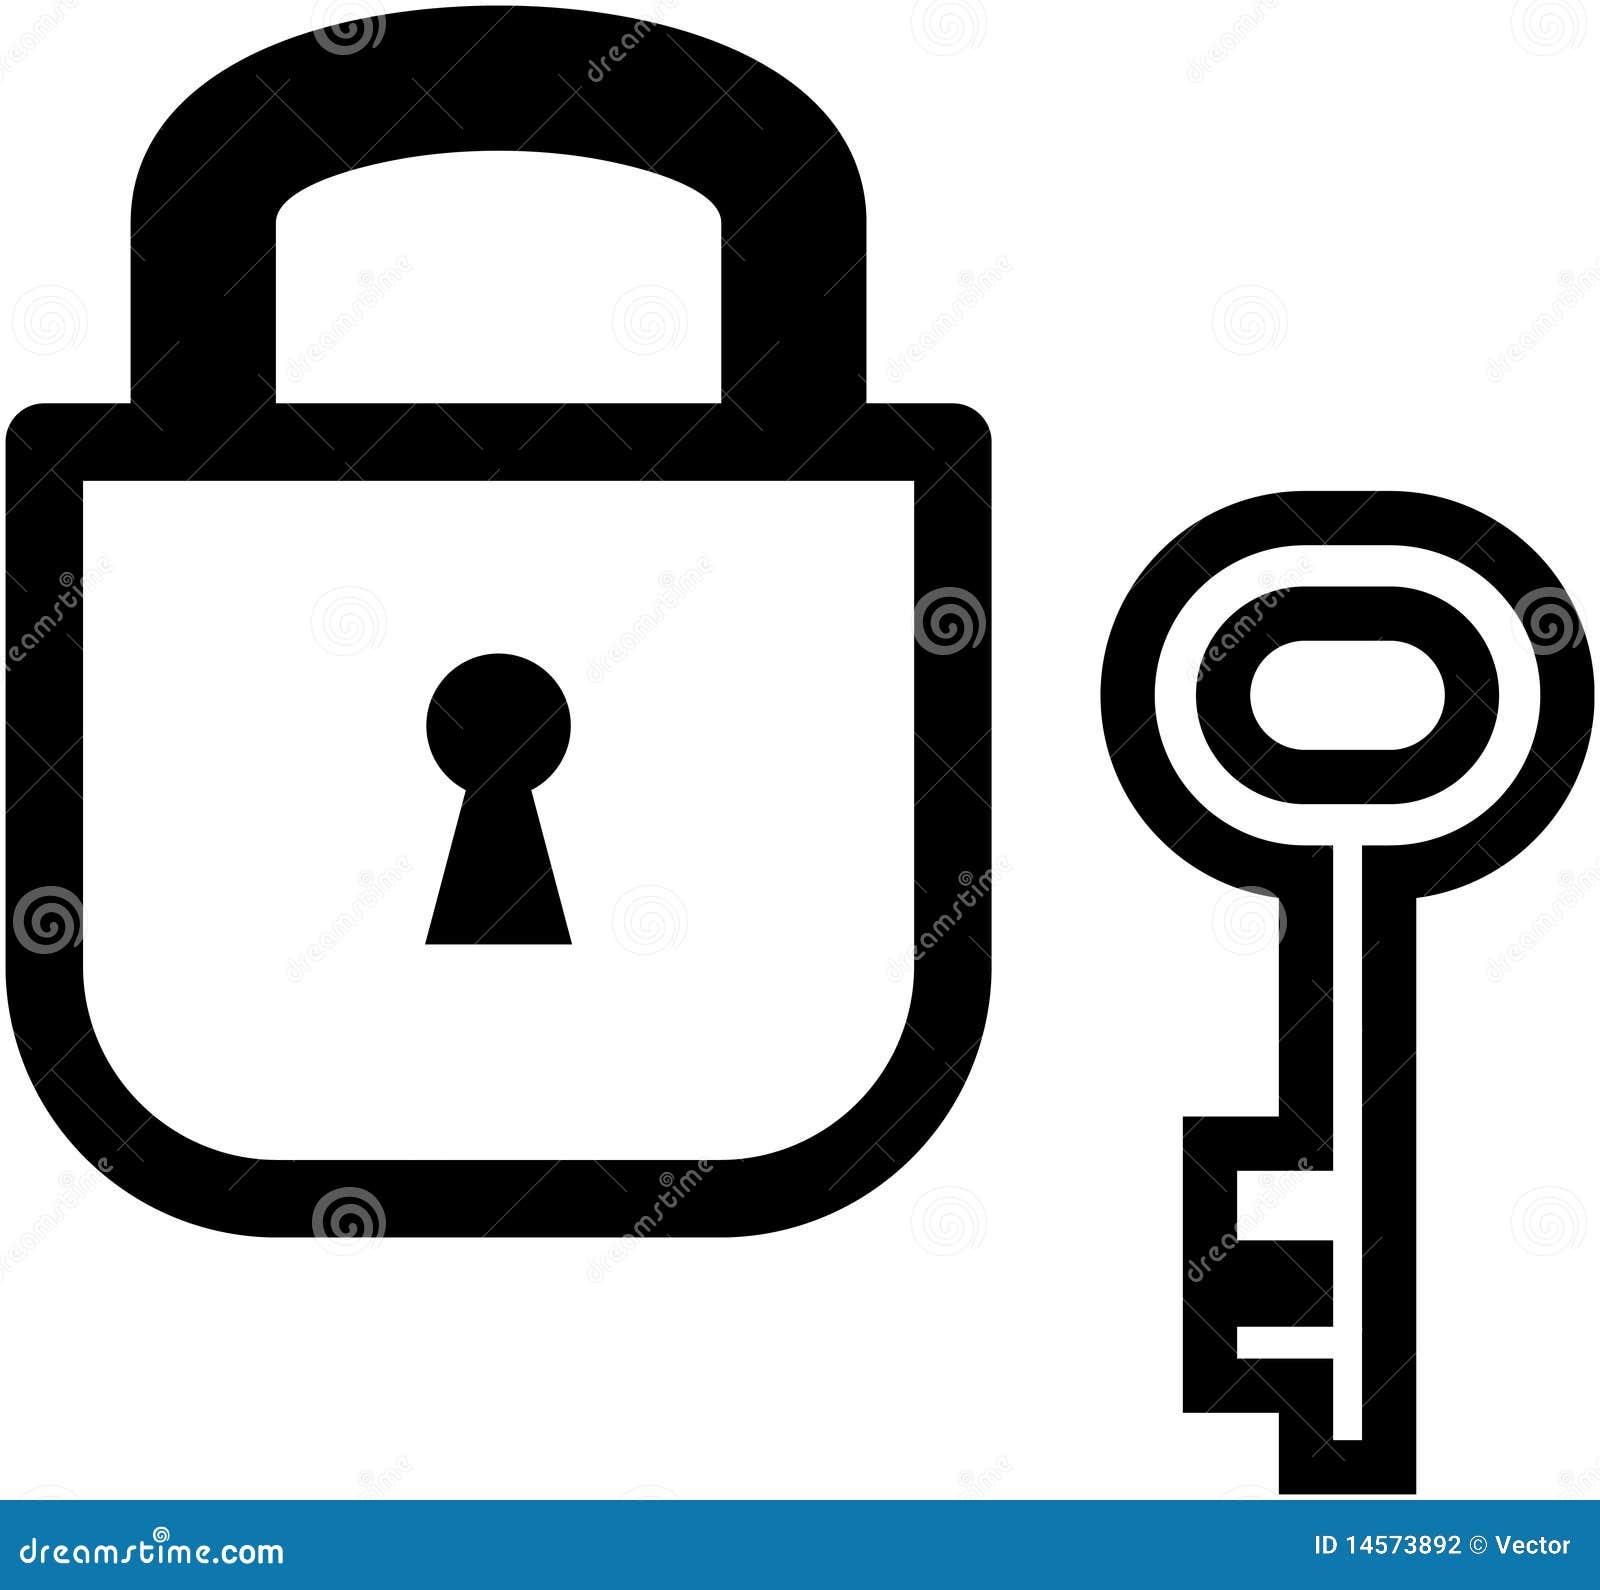 padlock and key clipart - photo #16